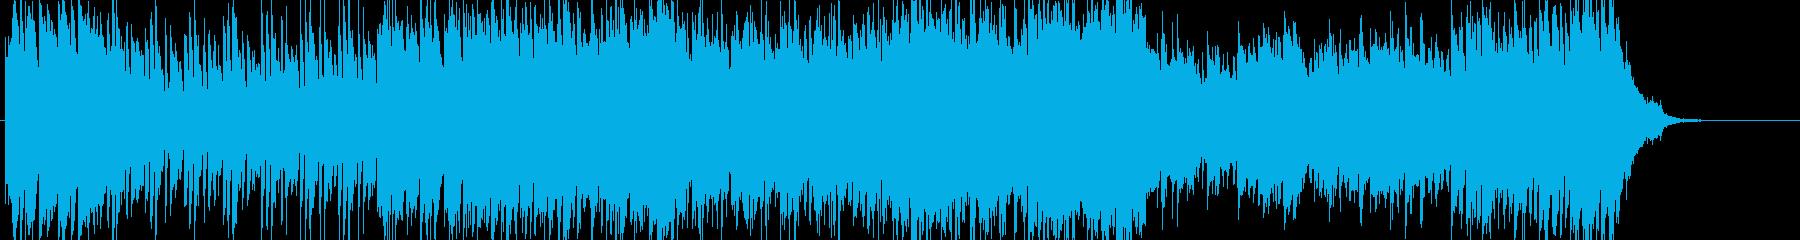 Overture-戦闘に勝利・PV/OPの再生済みの波形